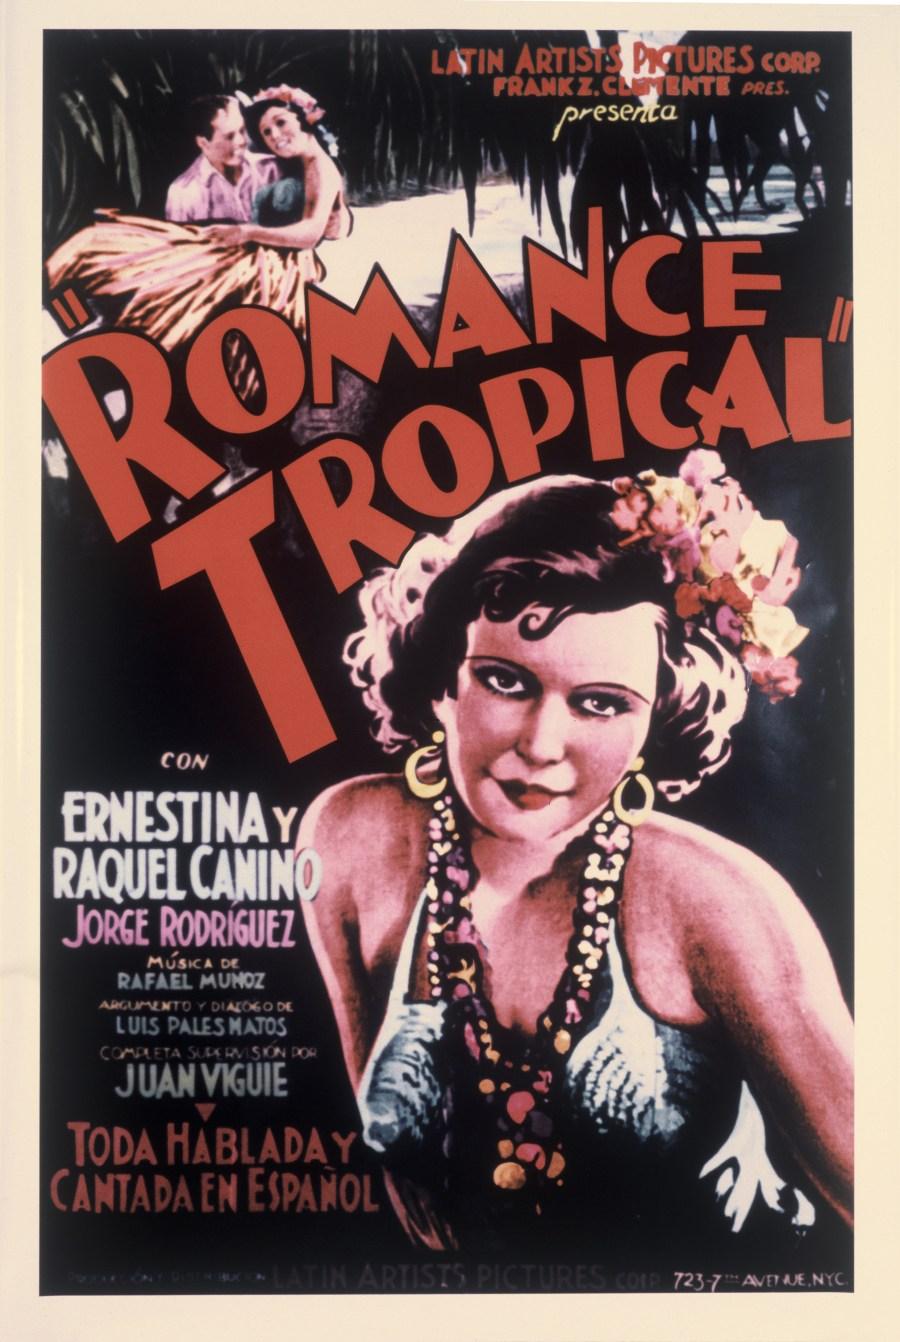 Portada Enero 2018 Imagen Romance Tropical cartel